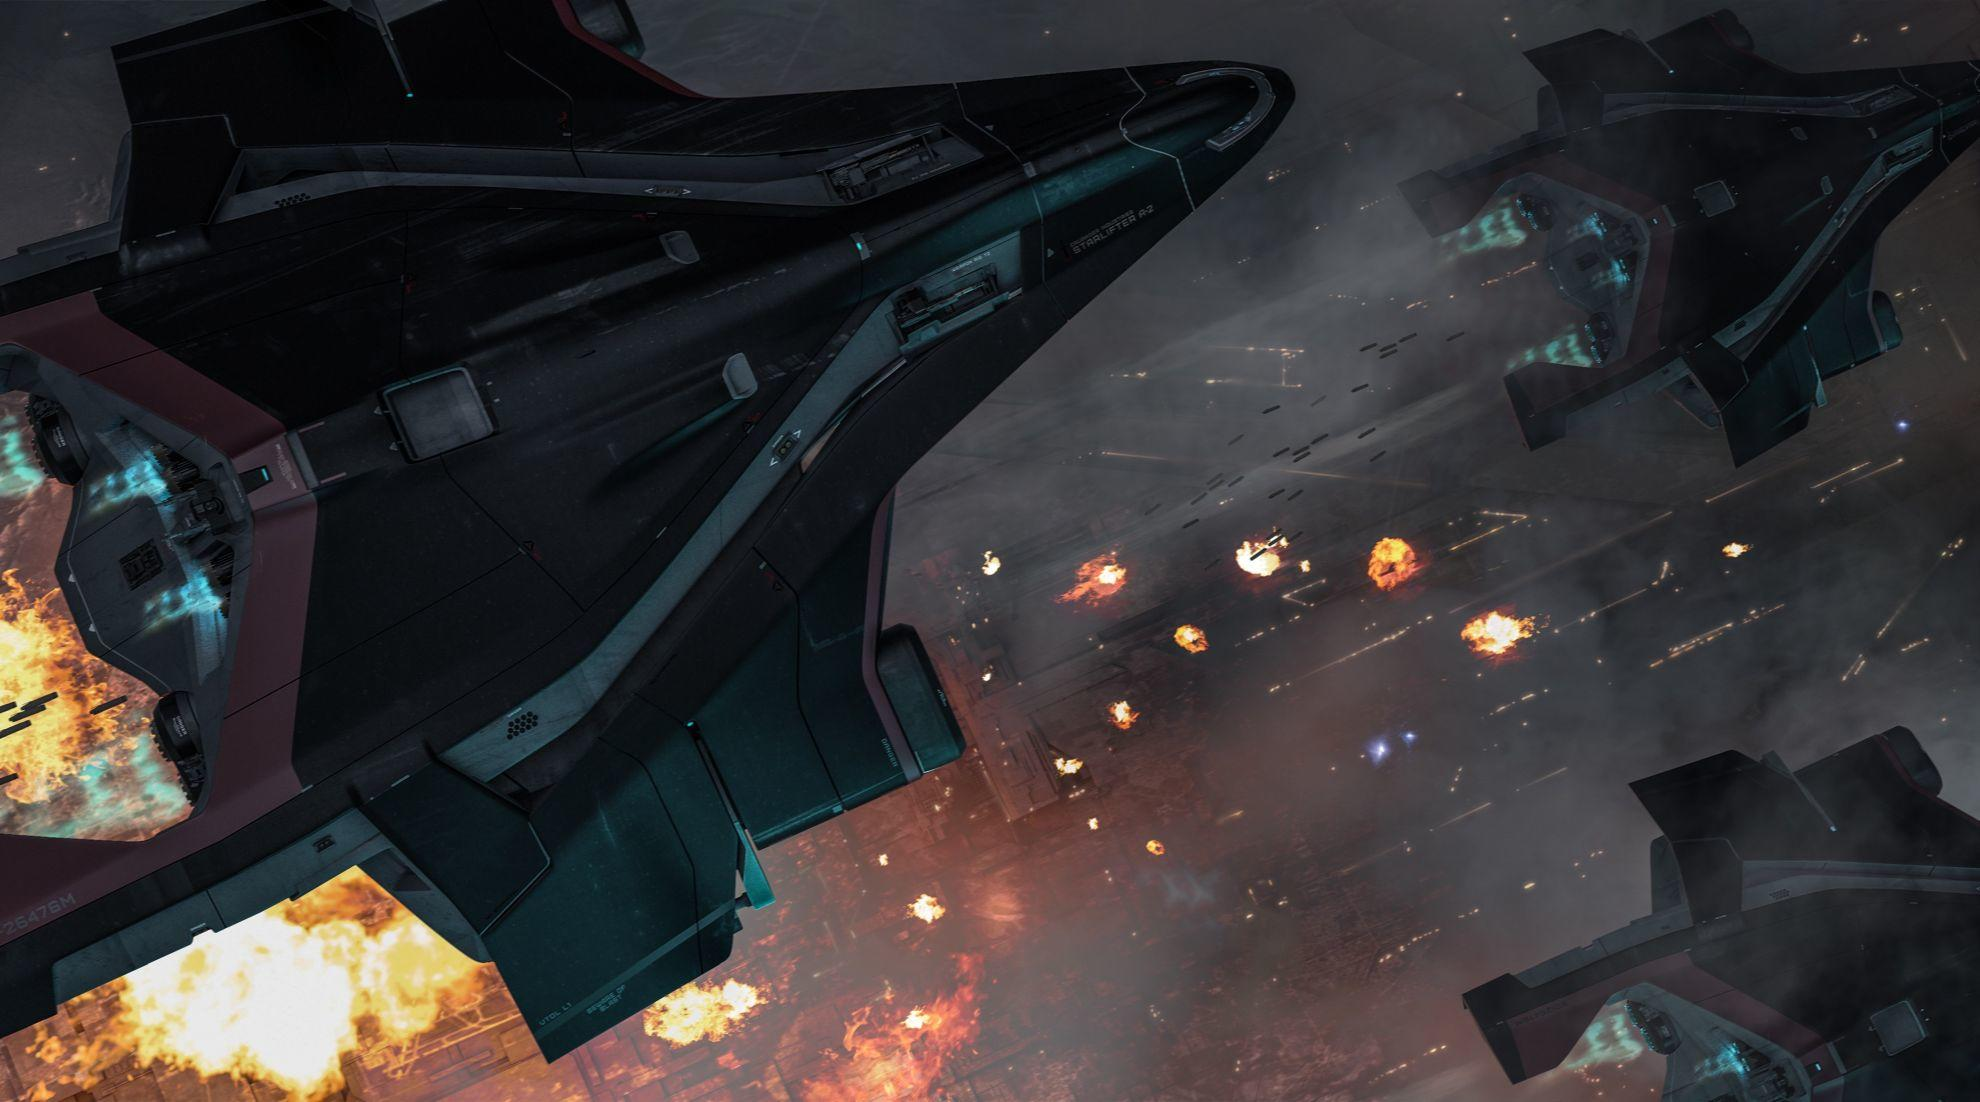 CRUS_Starlifter_Promo_Gunship_Bombing_MO02_.jpg